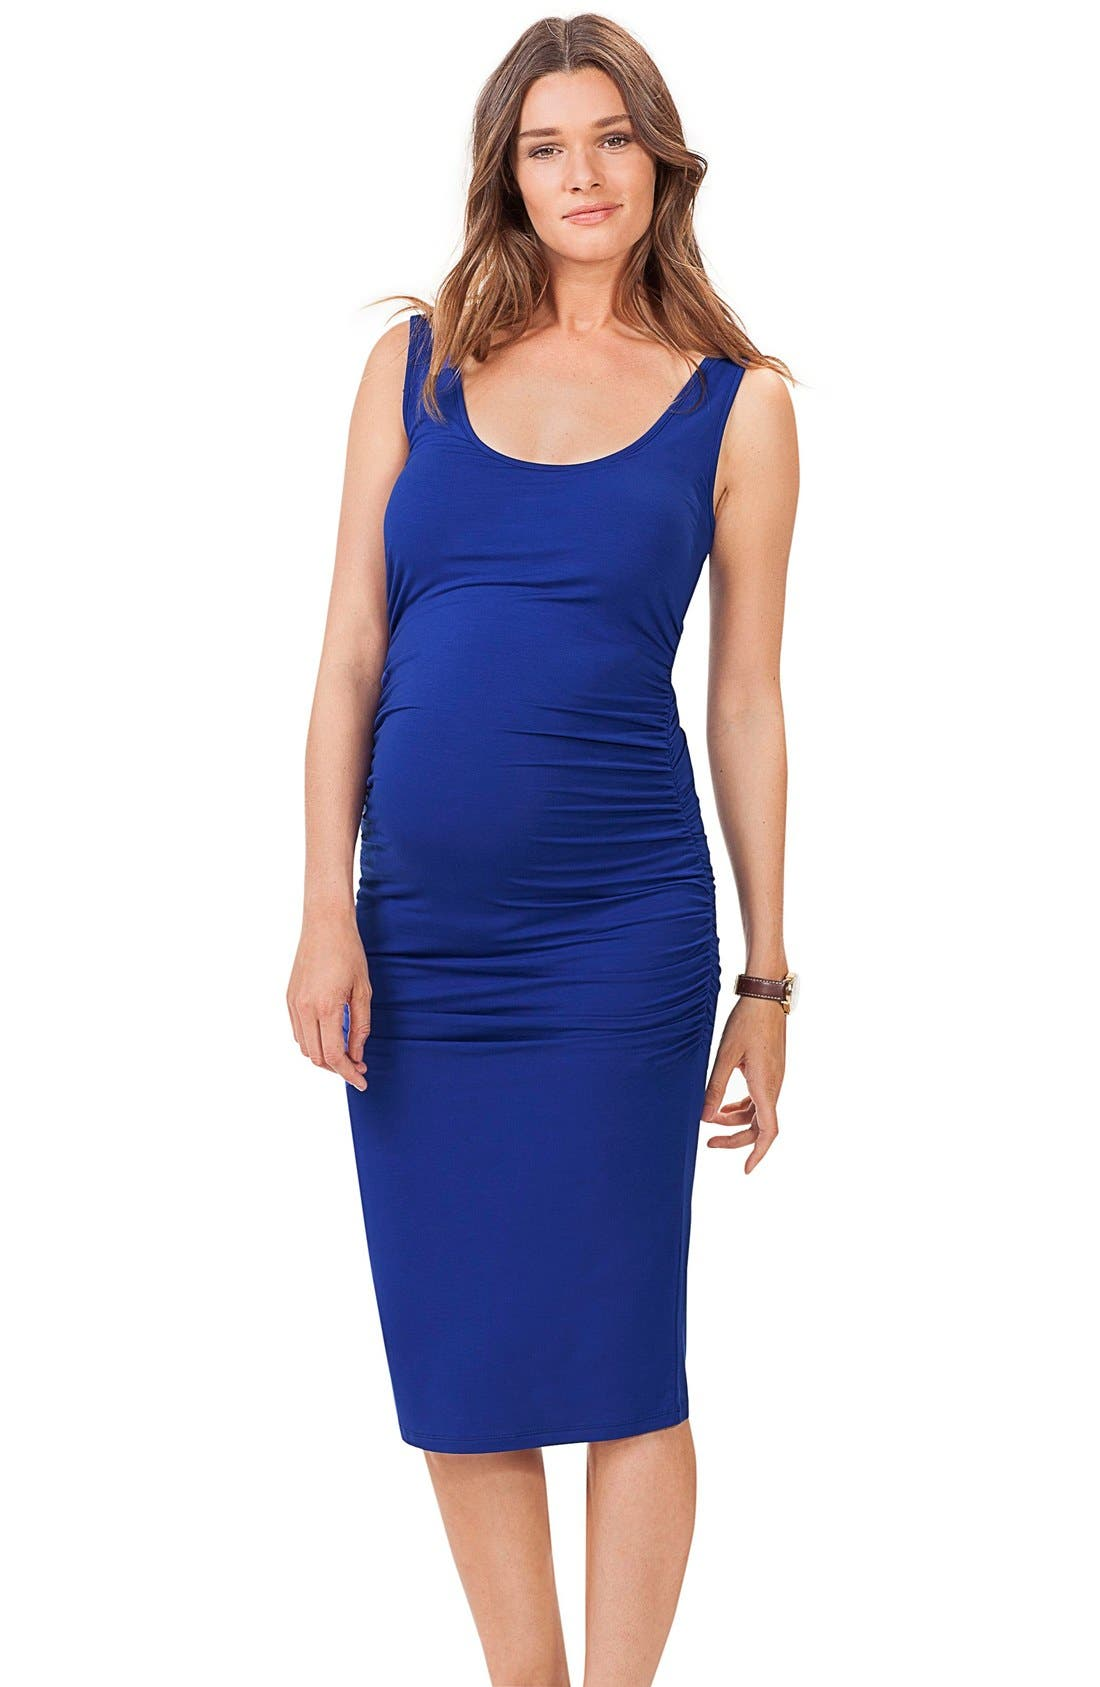 ISABELLA OLIVER,                             'Ellis' Side Ruched Maternity Tank Dress,                             Main thumbnail 1, color,                             PERSIAN BLUEDNU